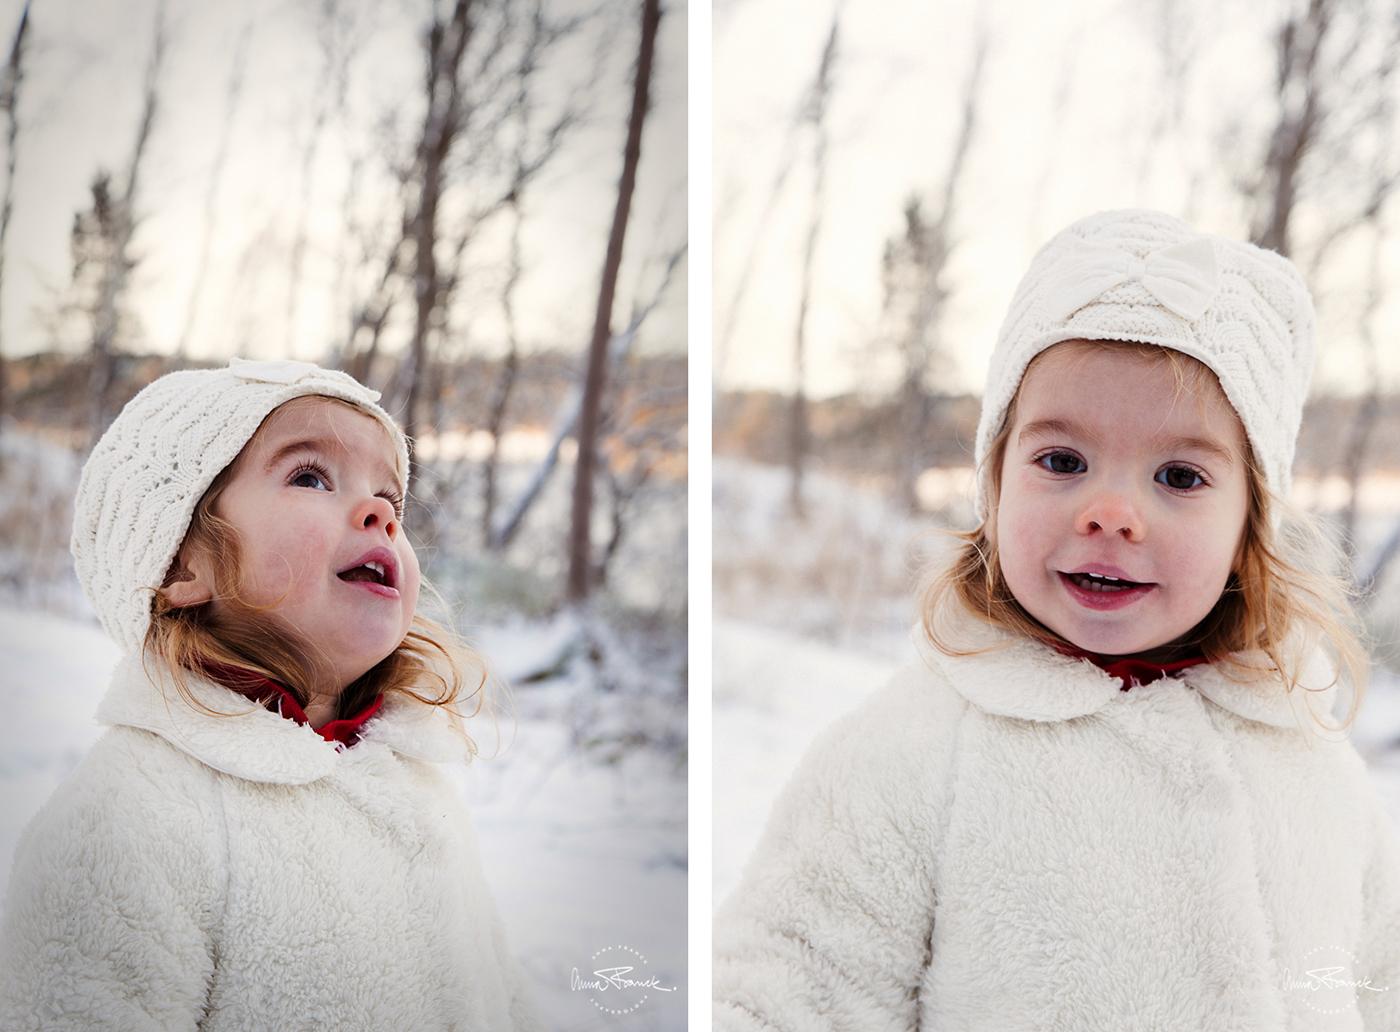 barnfotografering, lapsikuvaus, kids, portrait, photography, valokuvaus, fotografering, porträtt, anna, franck, winter, vinter, talvi, söpö, söt, sweet, stockholm, sweden, sverige, snö, snow, lunta